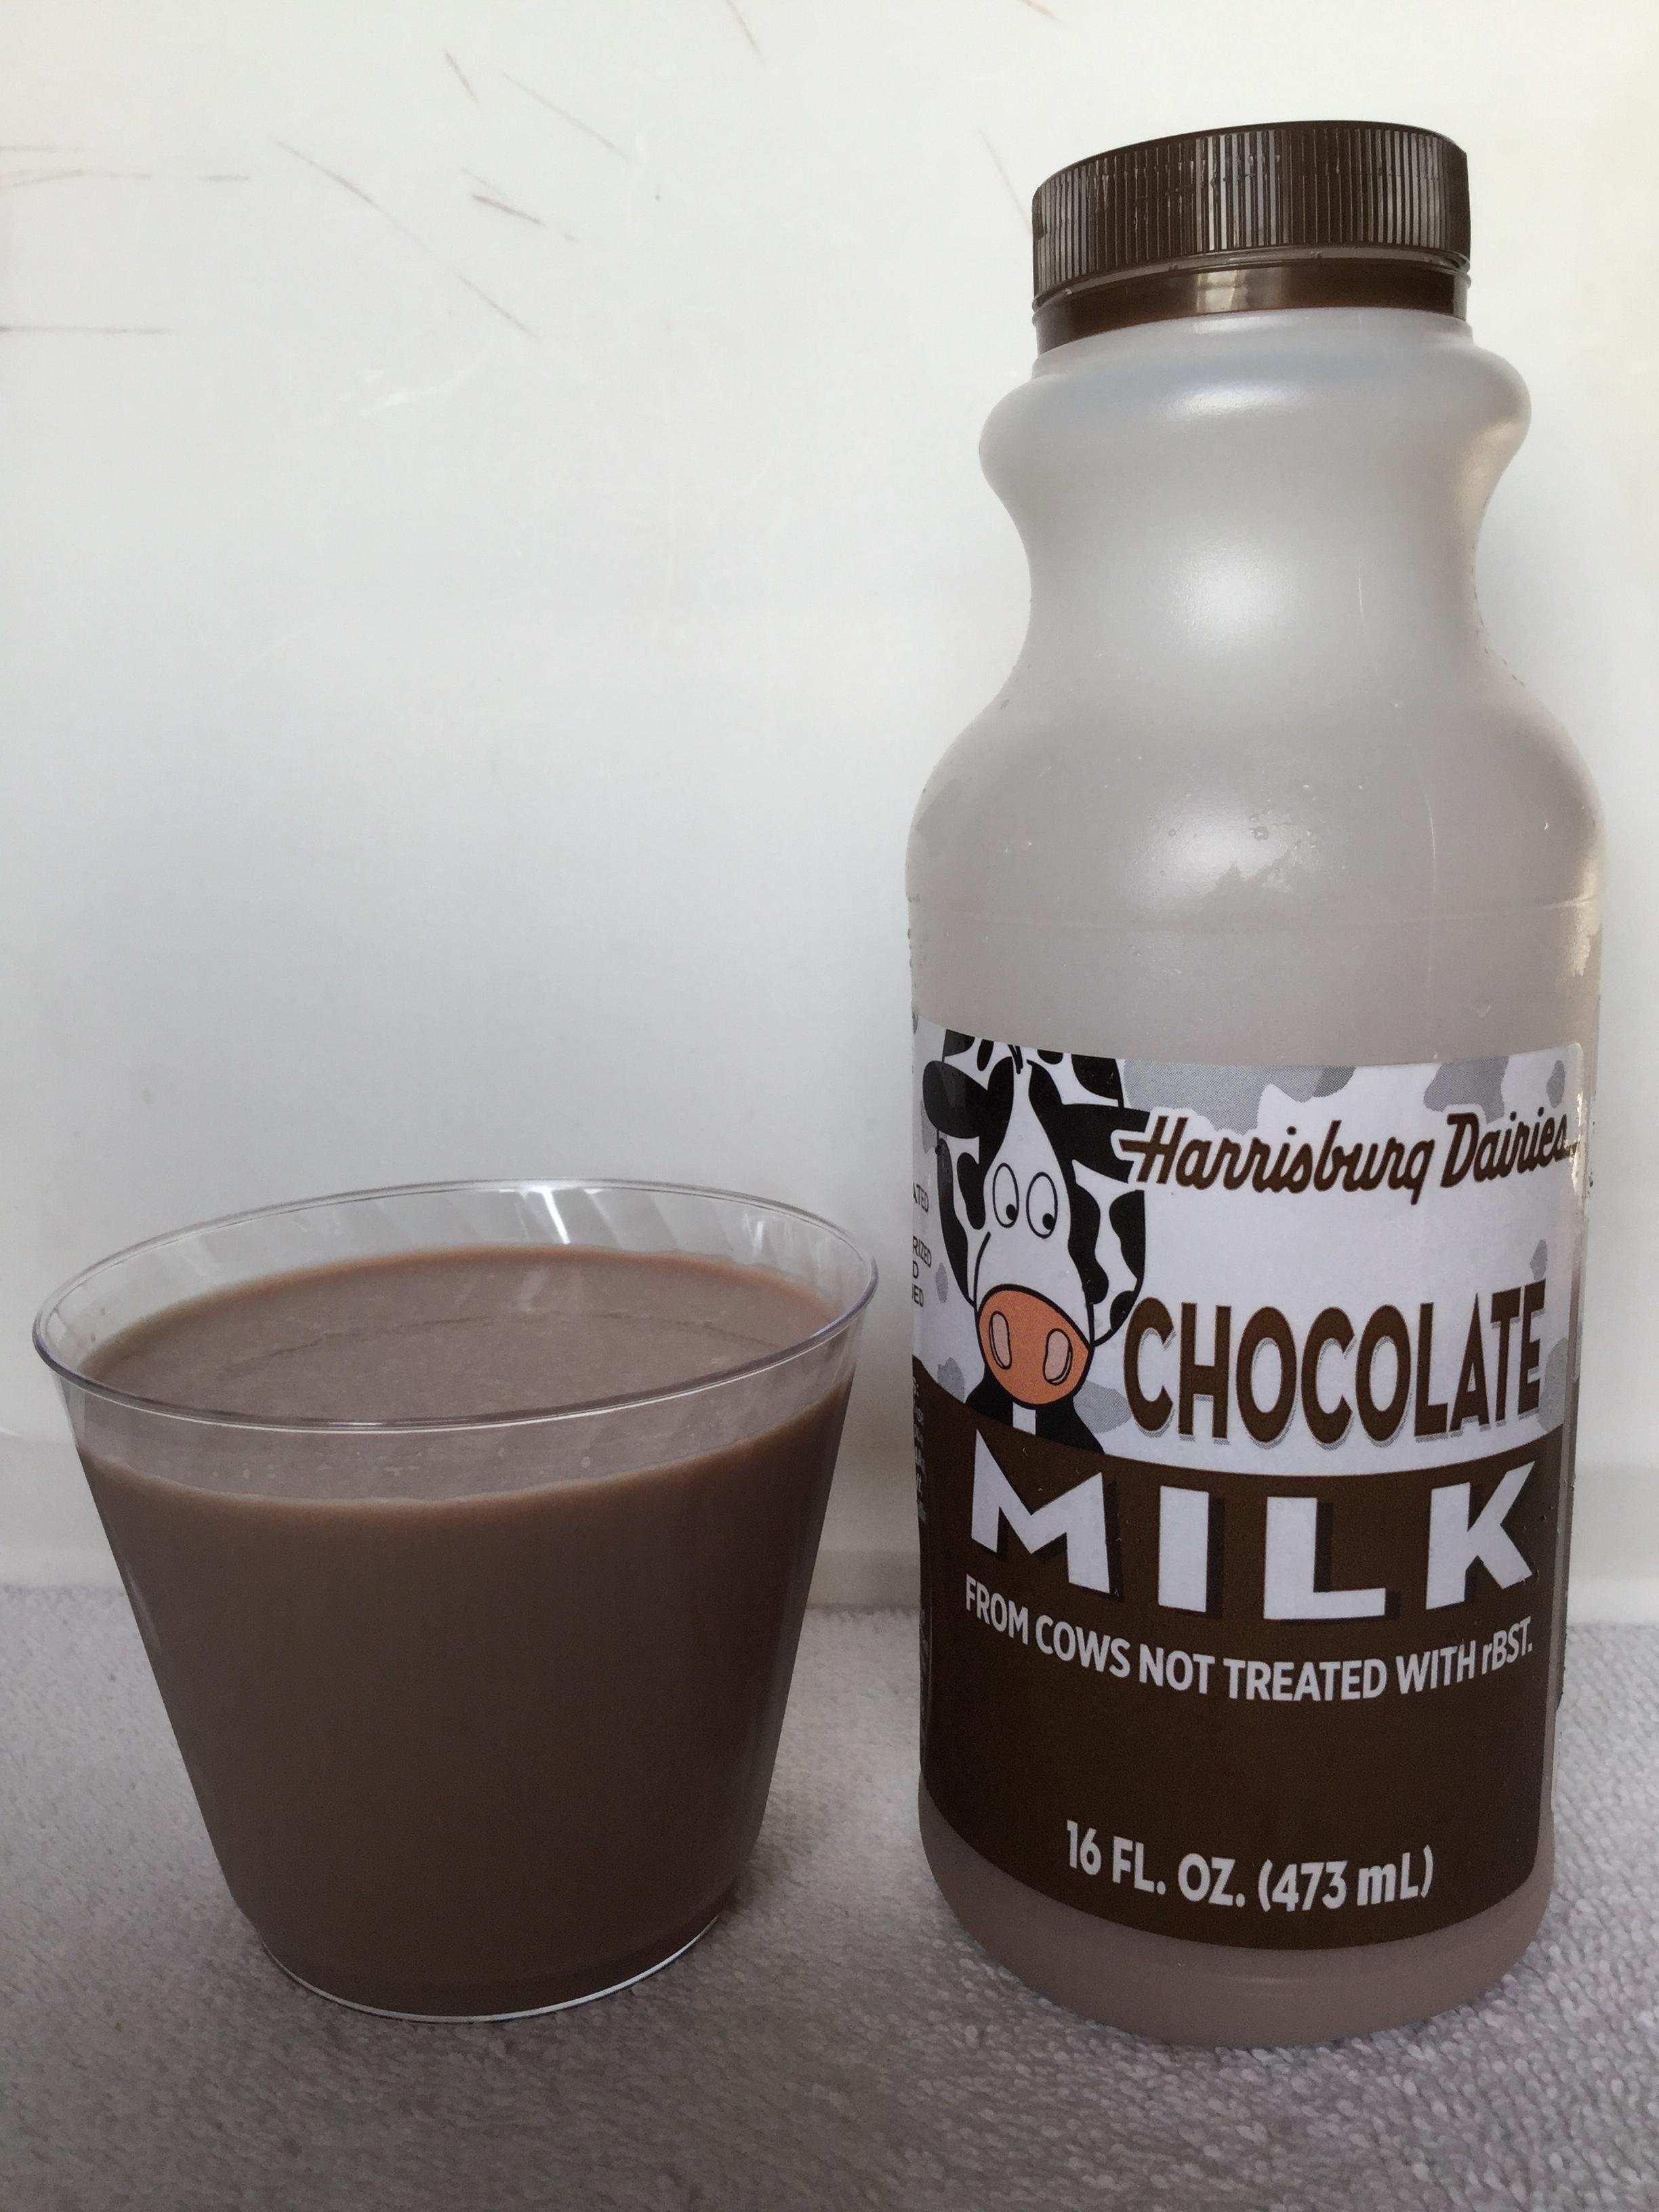 Harrisburg Dairies Chocolate Milk Cup